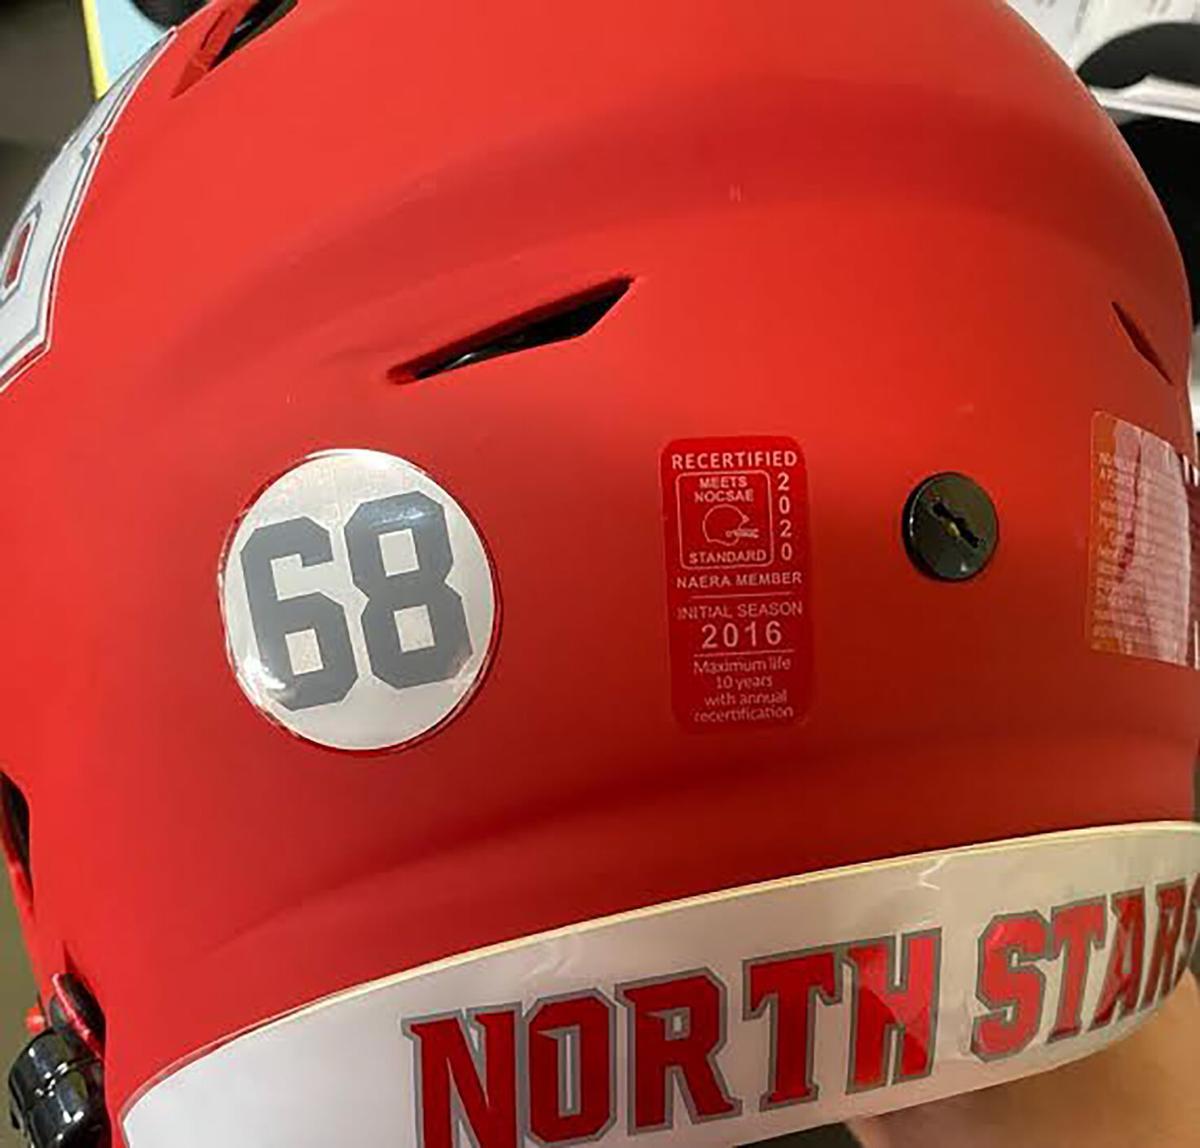 Burch helmet sticker